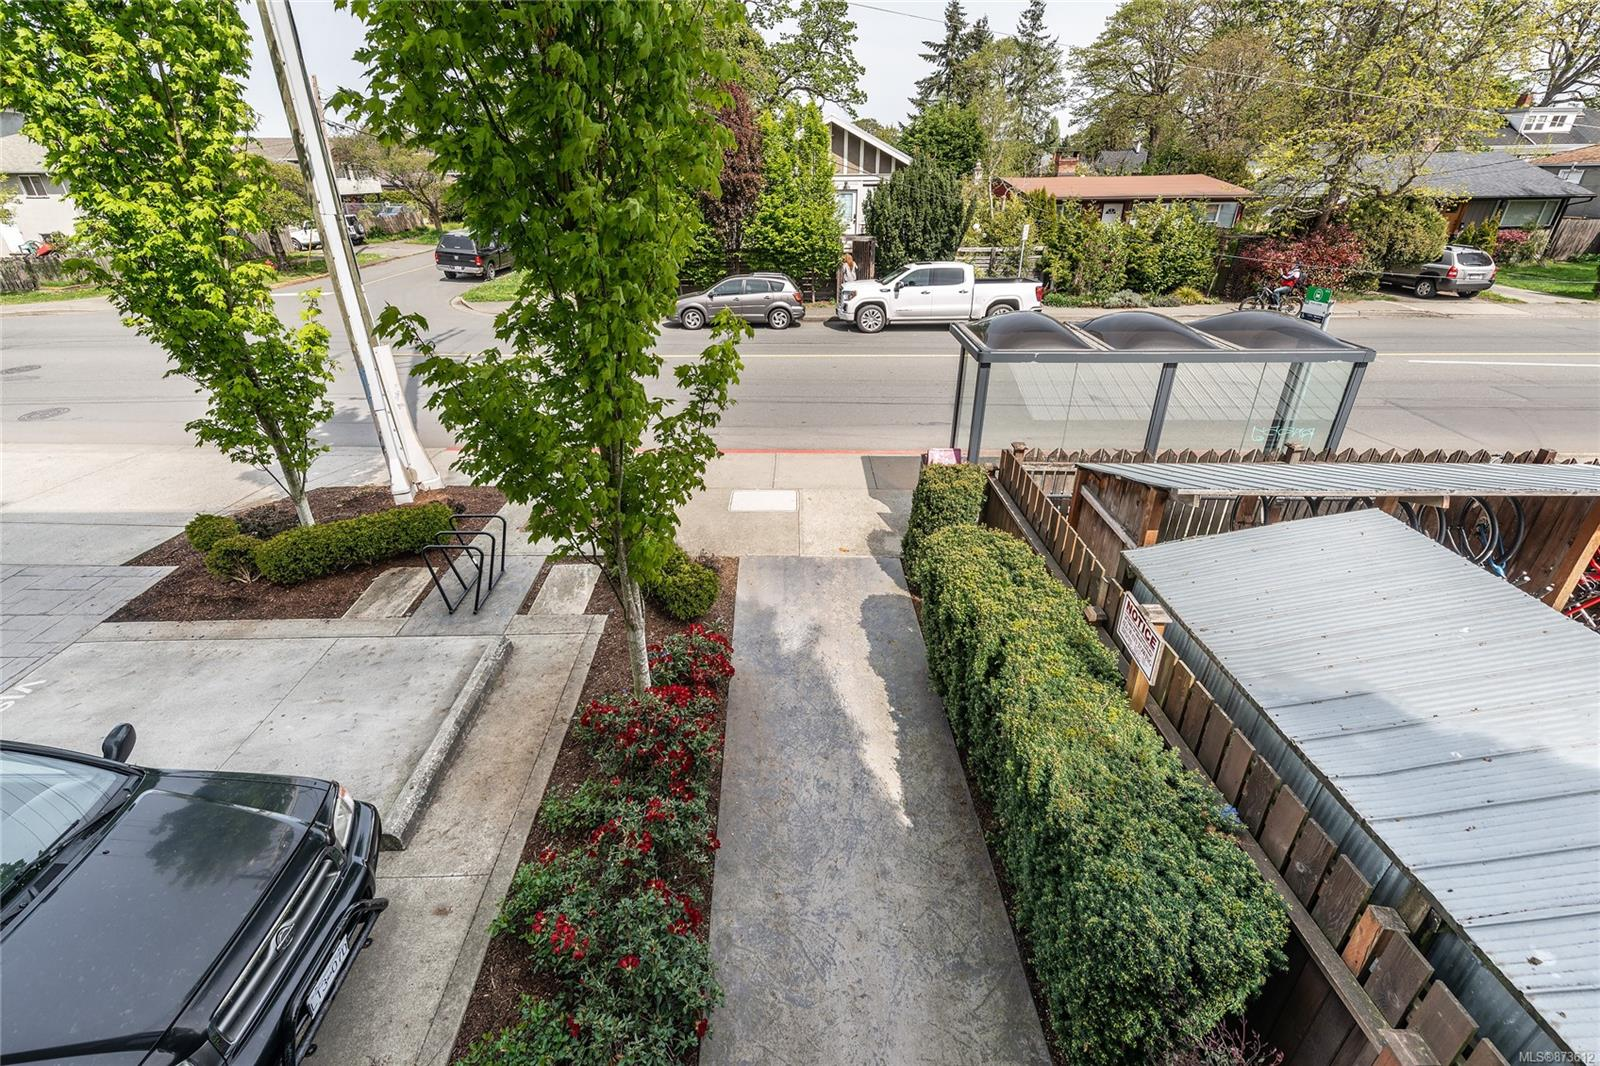 Photo 13 at 202 - 1615 Bay Street, Fernwood, Victoria